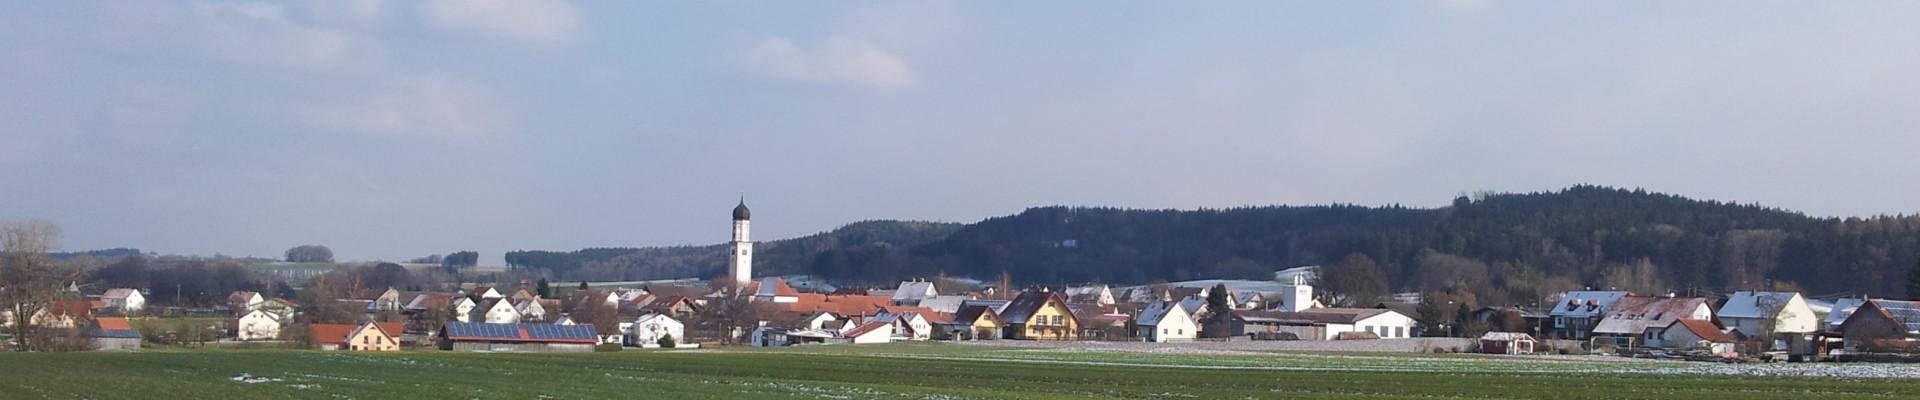 Breitenbronn_20130315.jpg